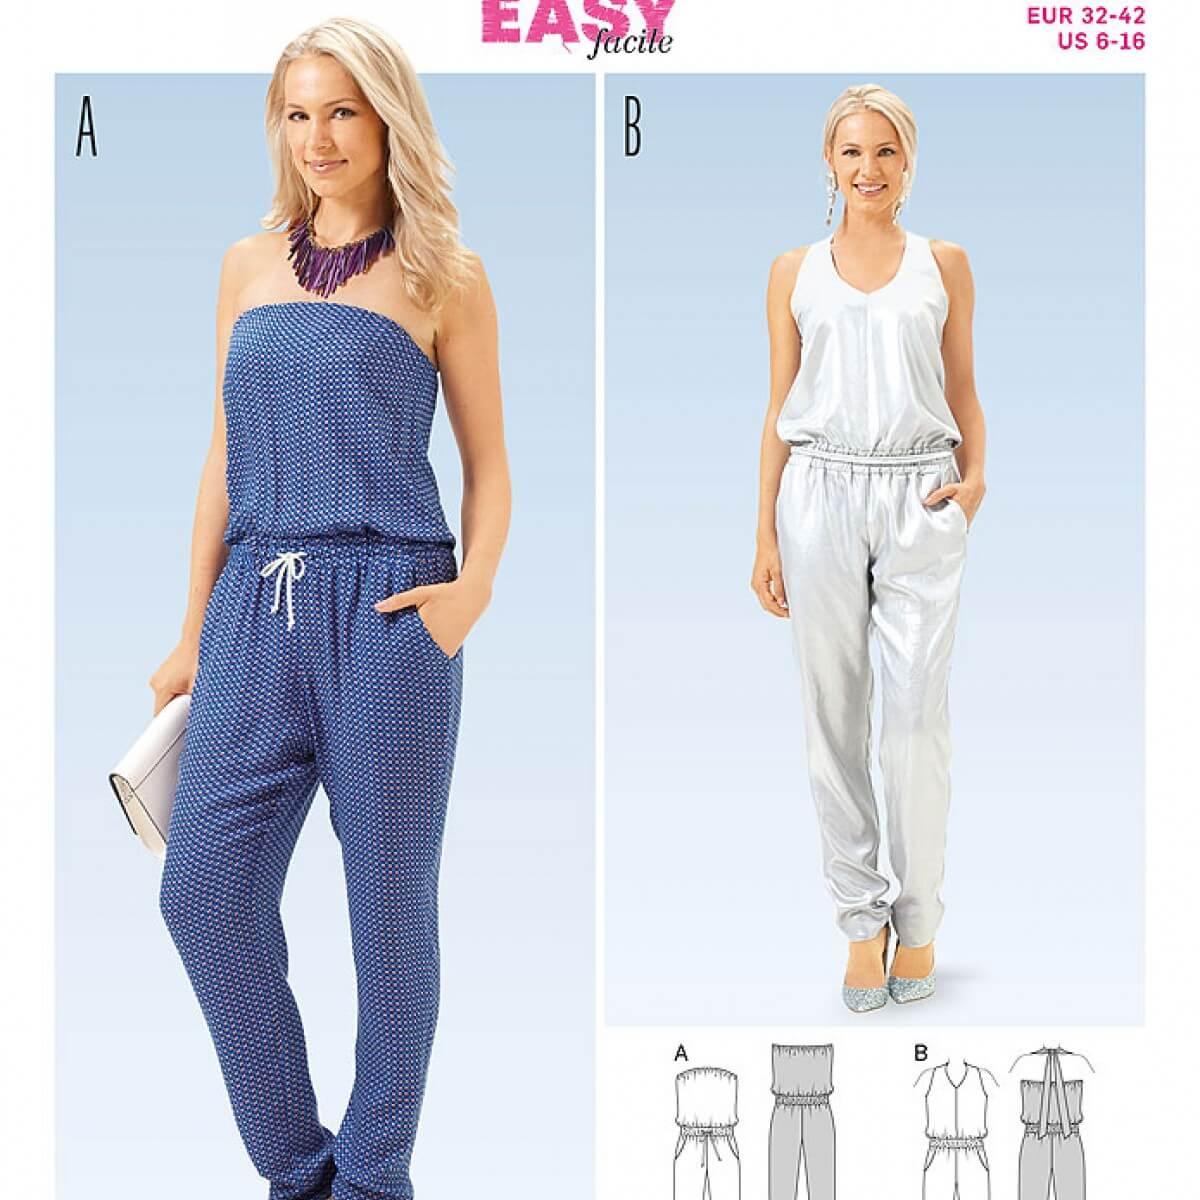 patron jeans femme patron gratuit homme femme jean blog couture pdf free pattern made france pantalo. Black Bedroom Furniture Sets. Home Design Ideas